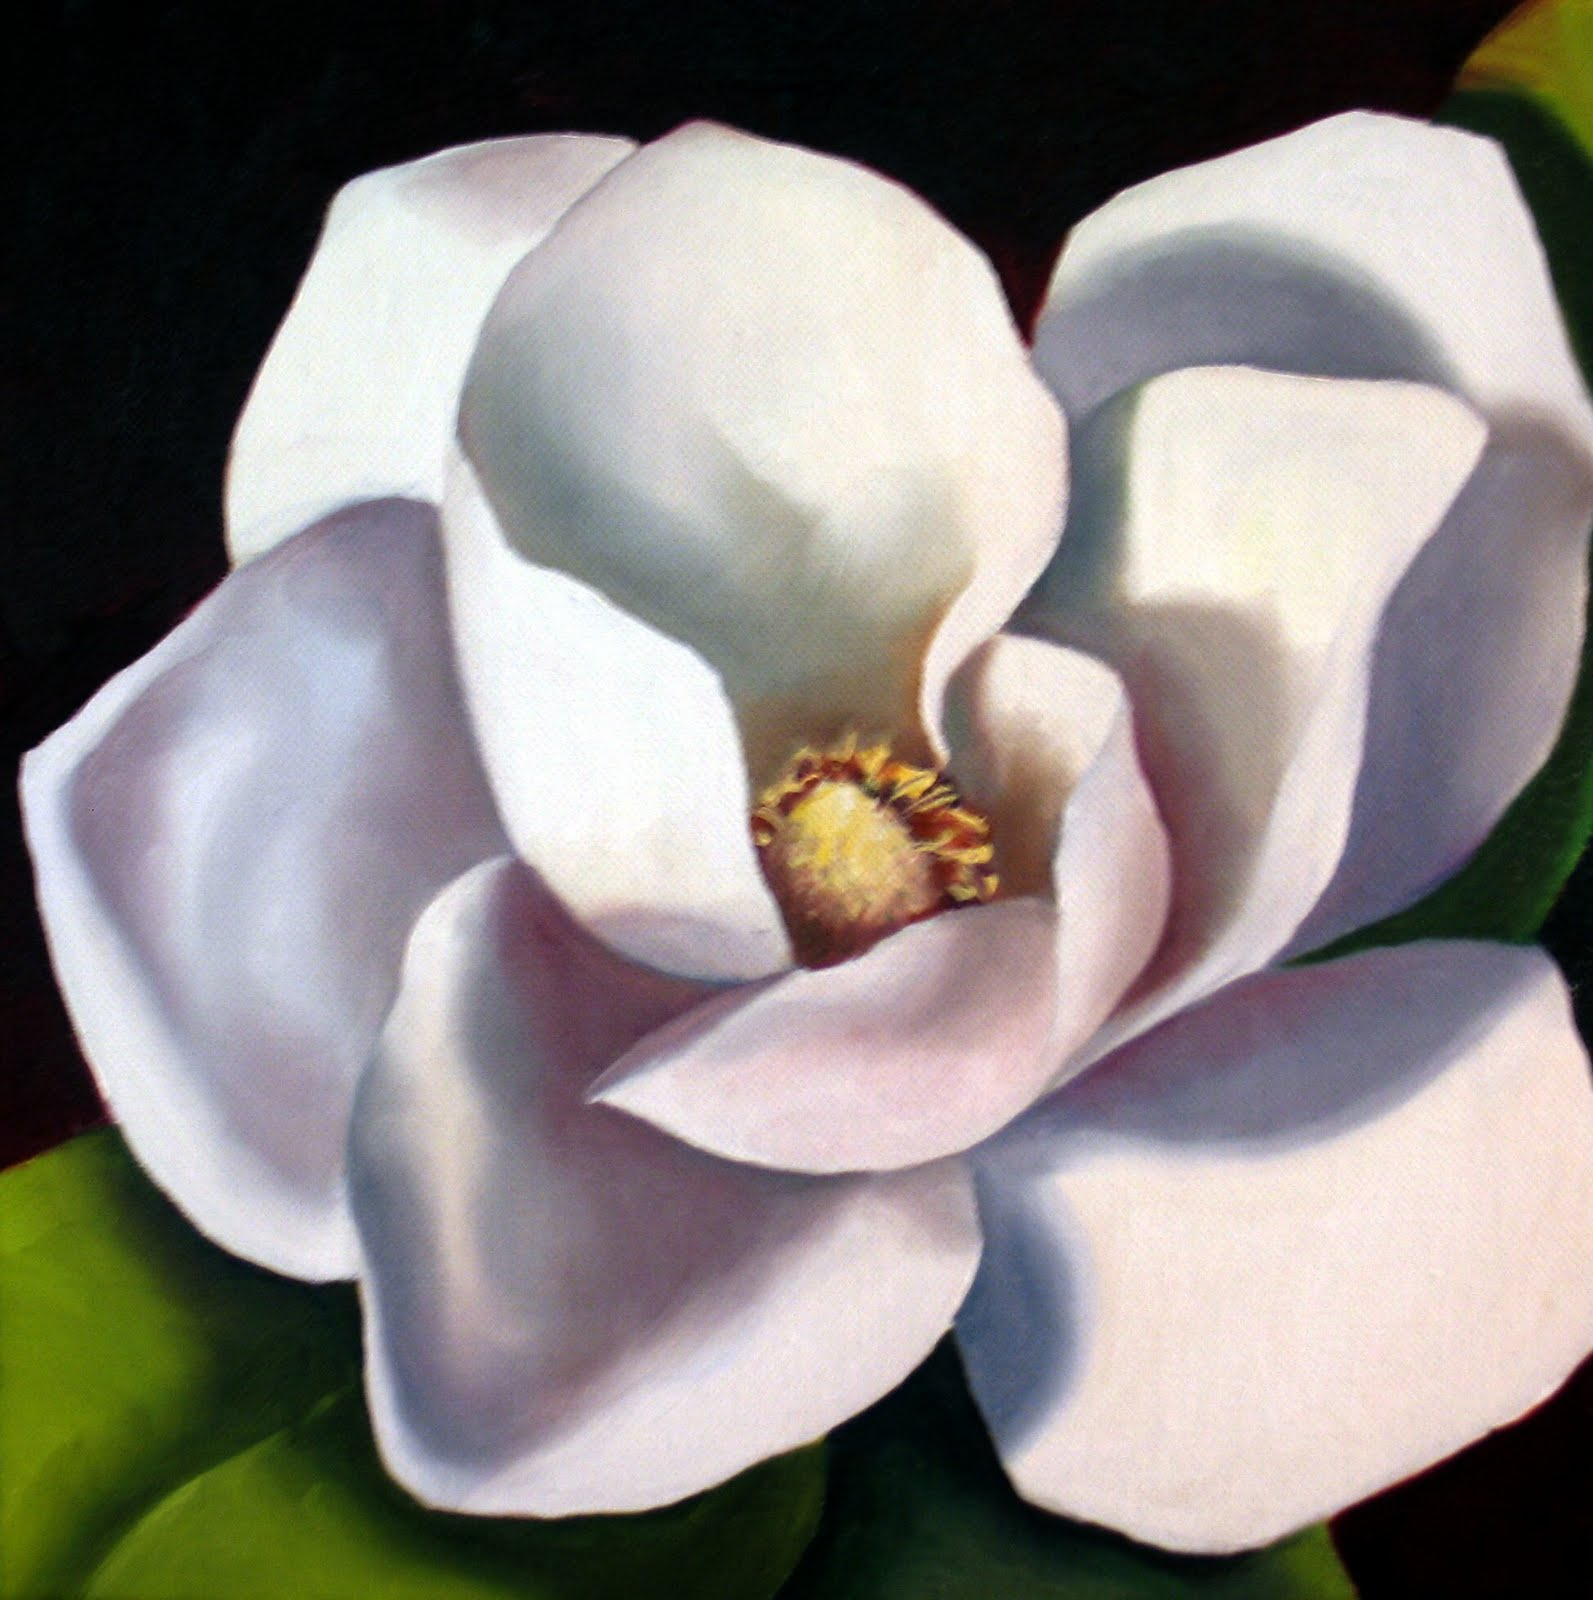 magnolia painting - photo #37